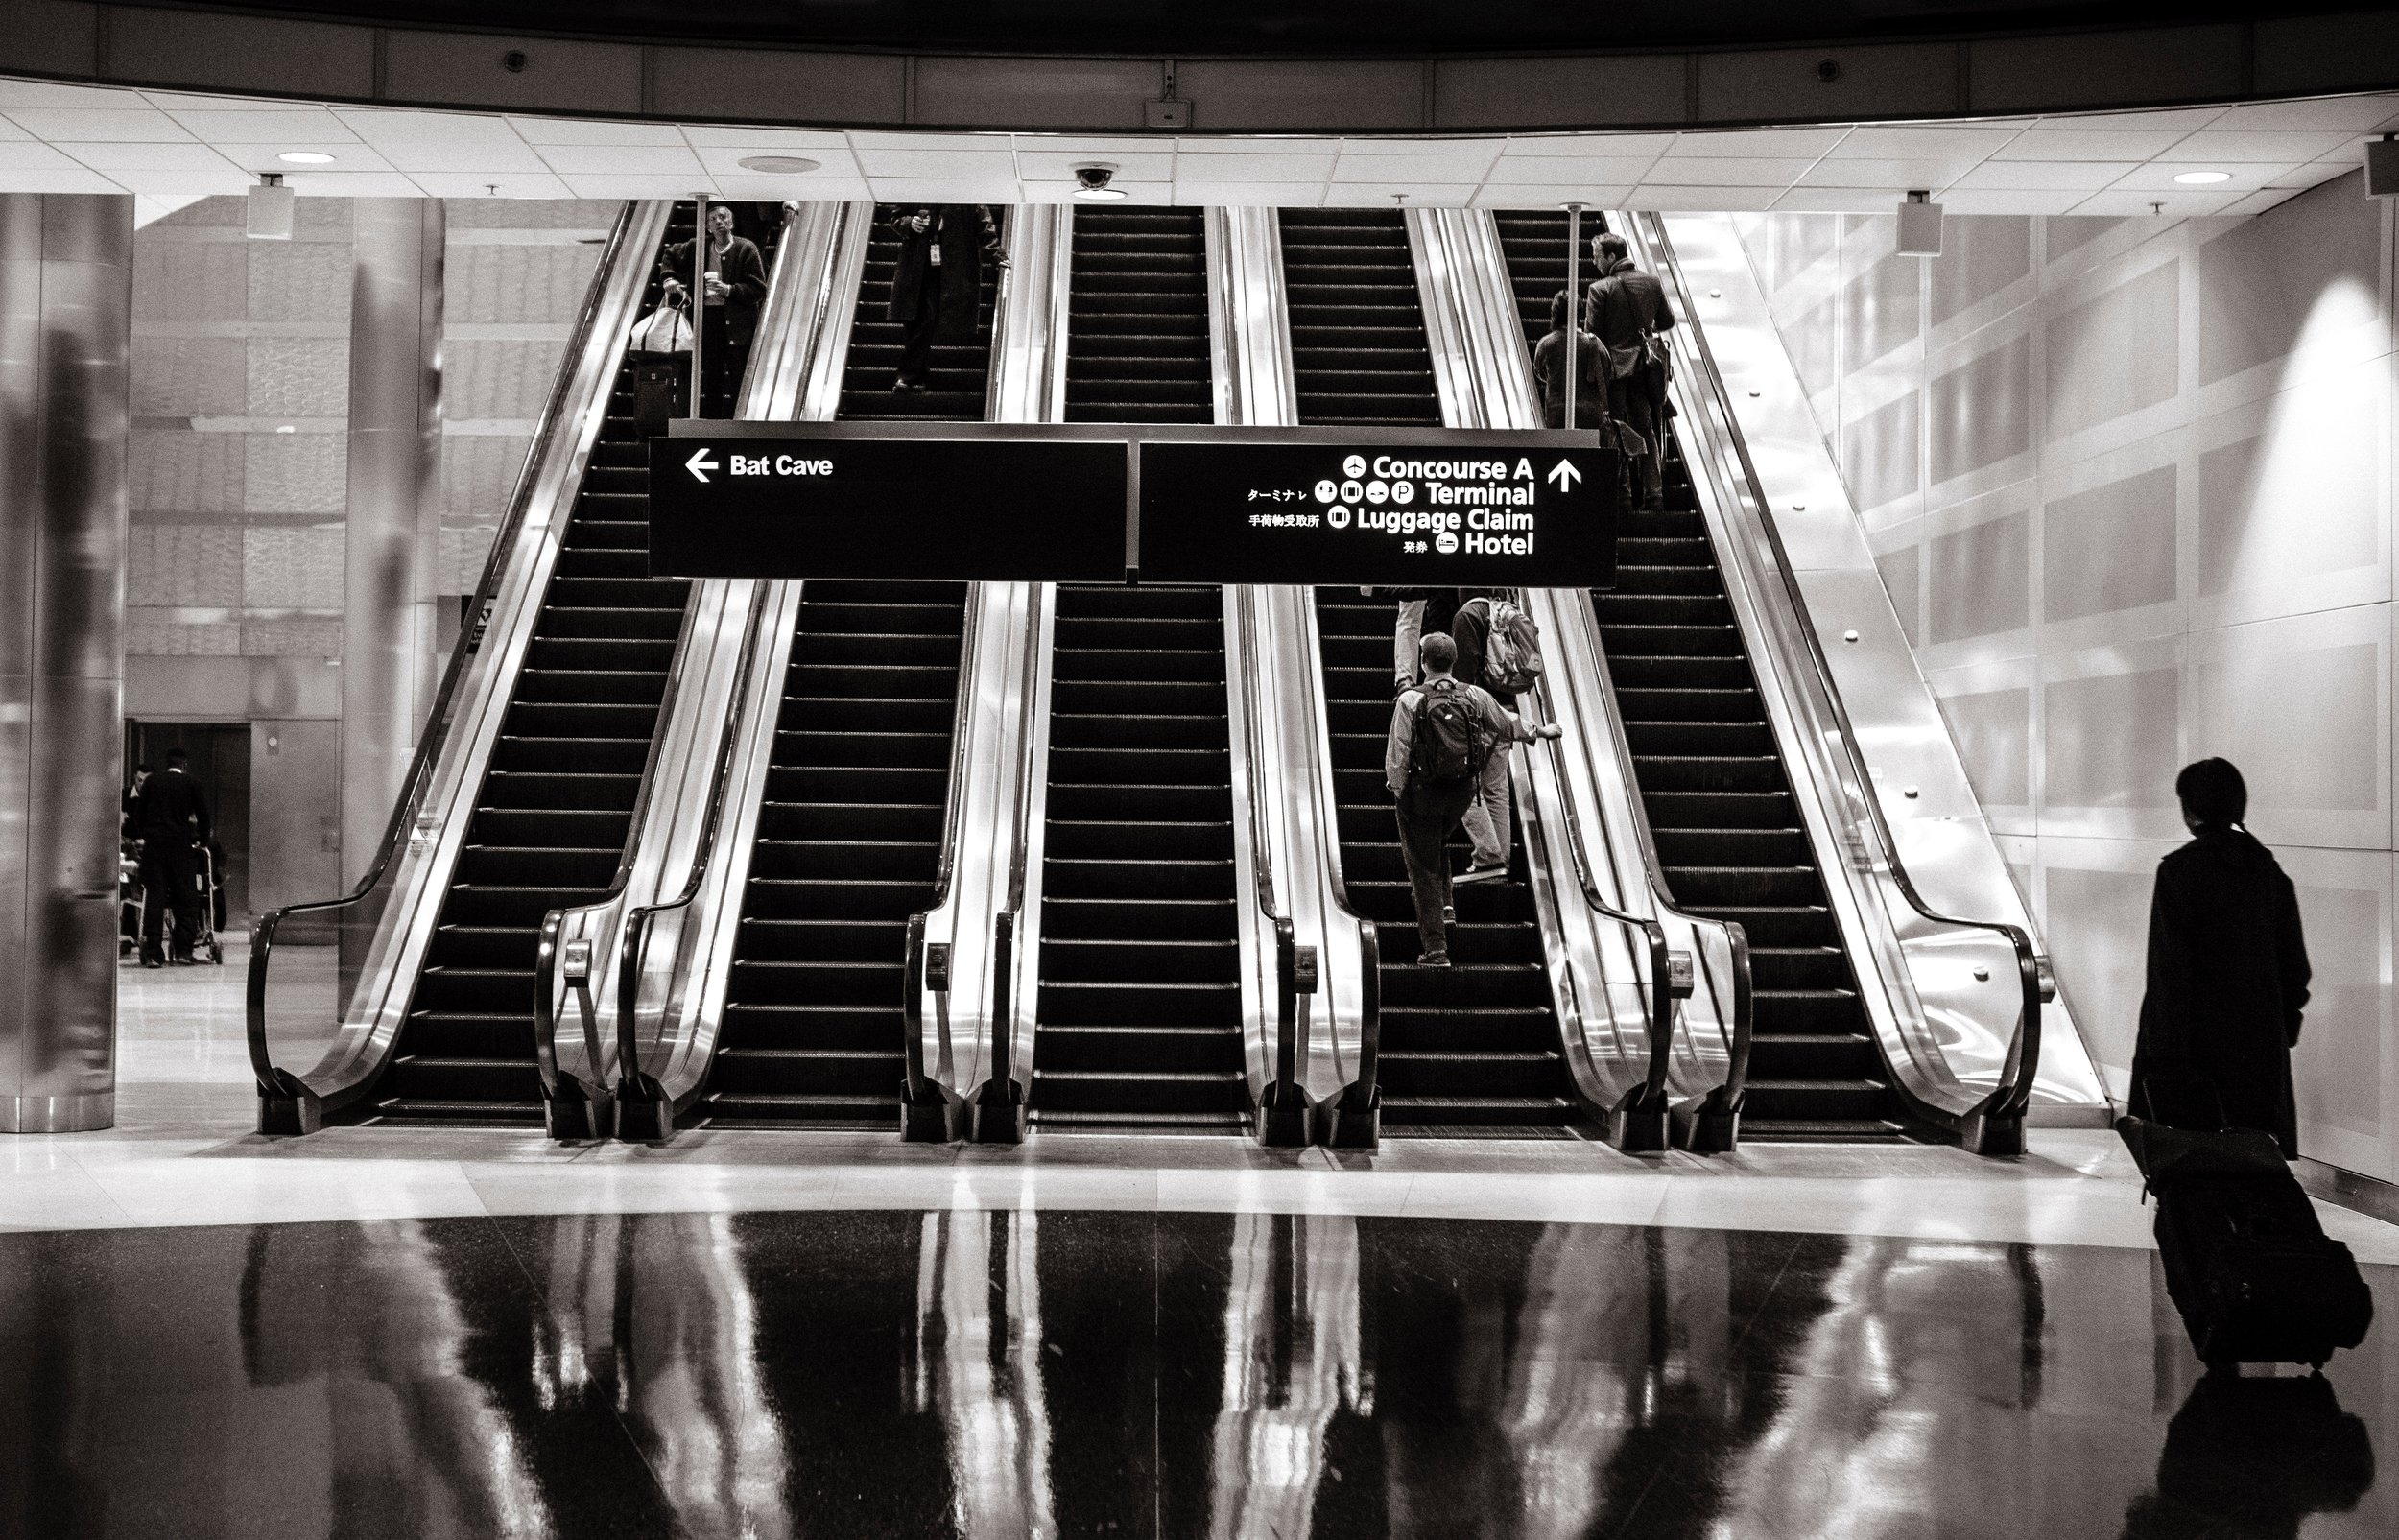 airport-escalators-moving-4610.jpg